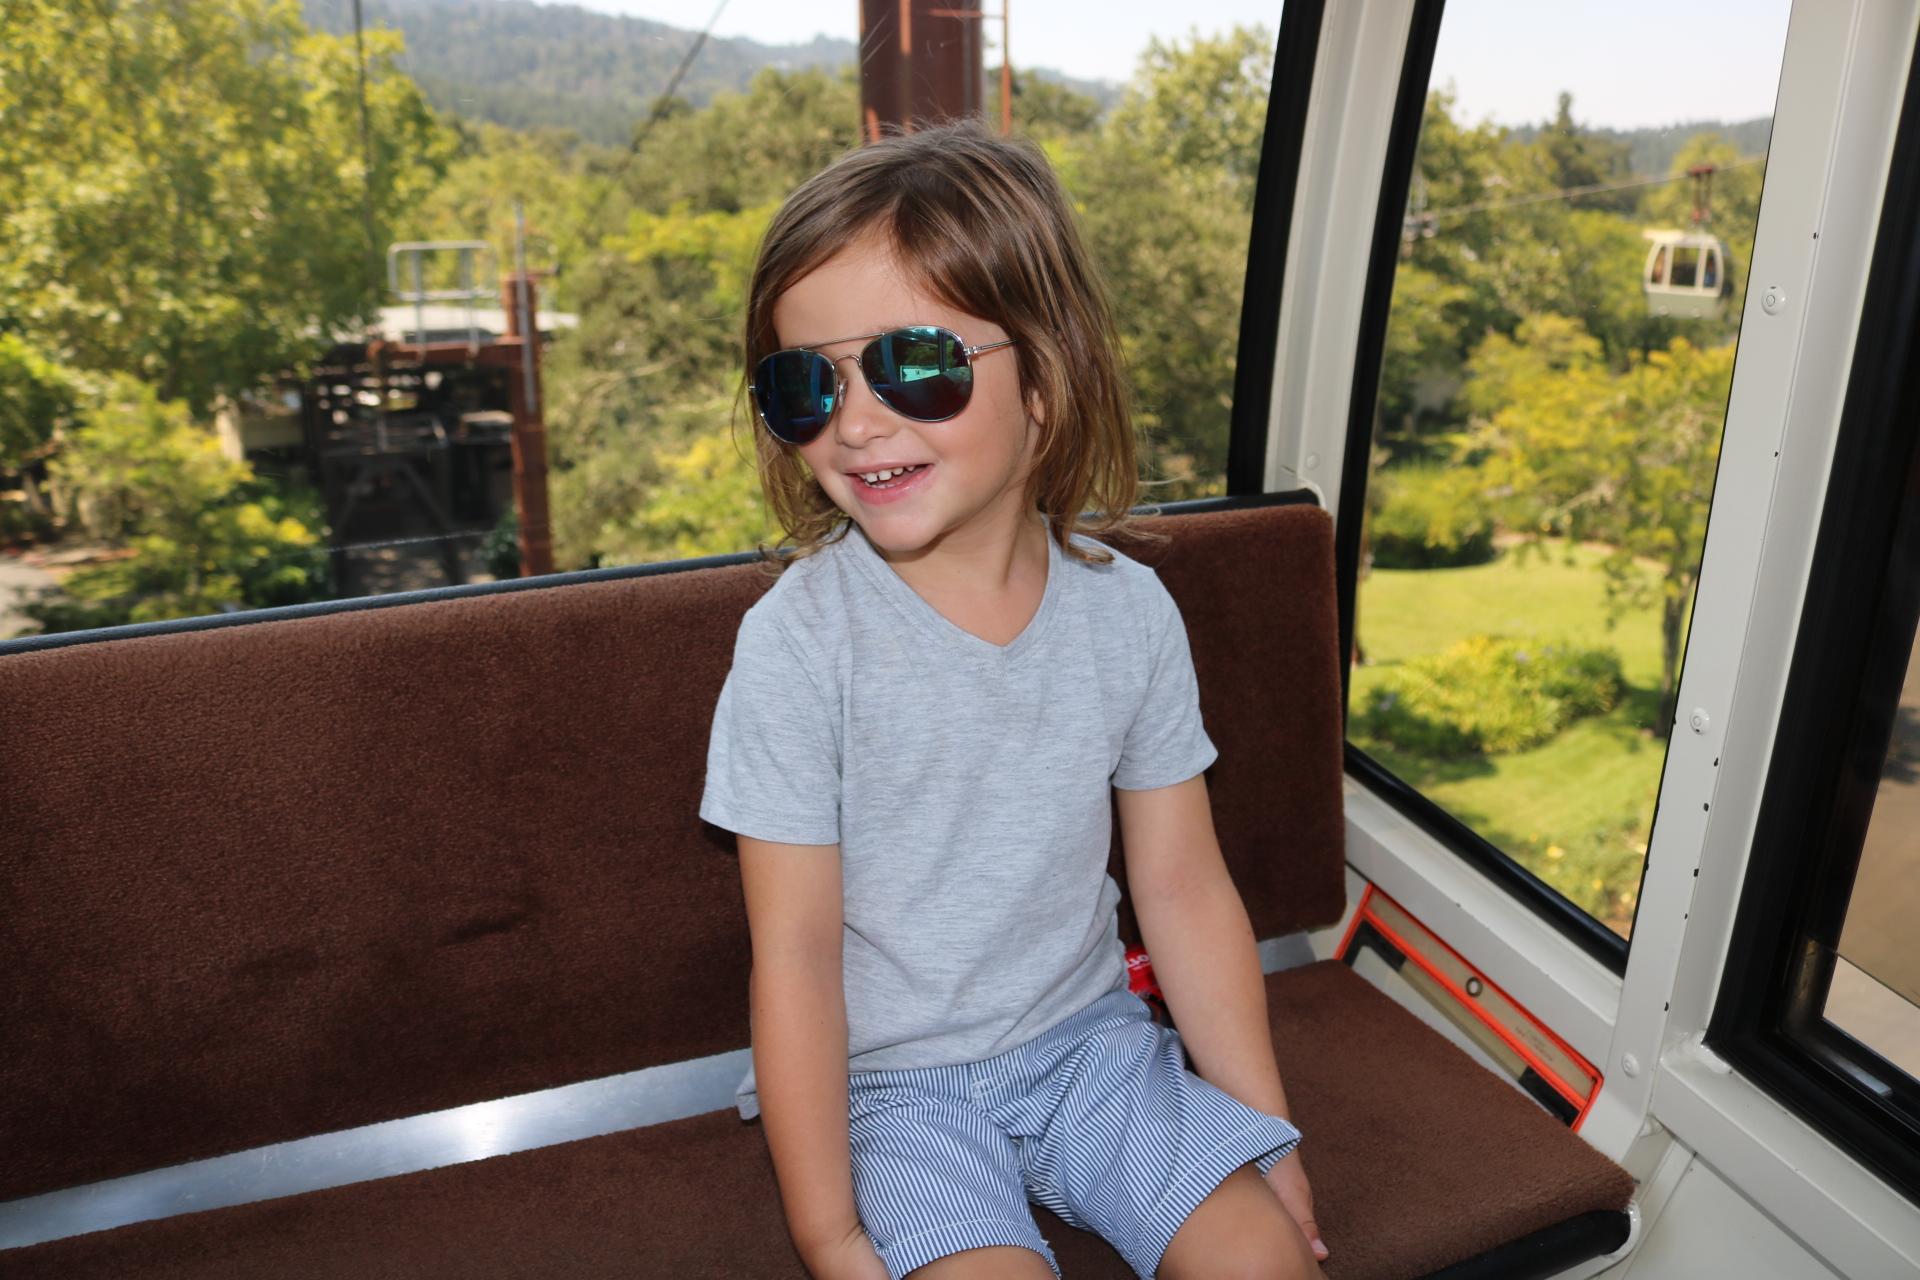 Feeling cool in the aerial tram!